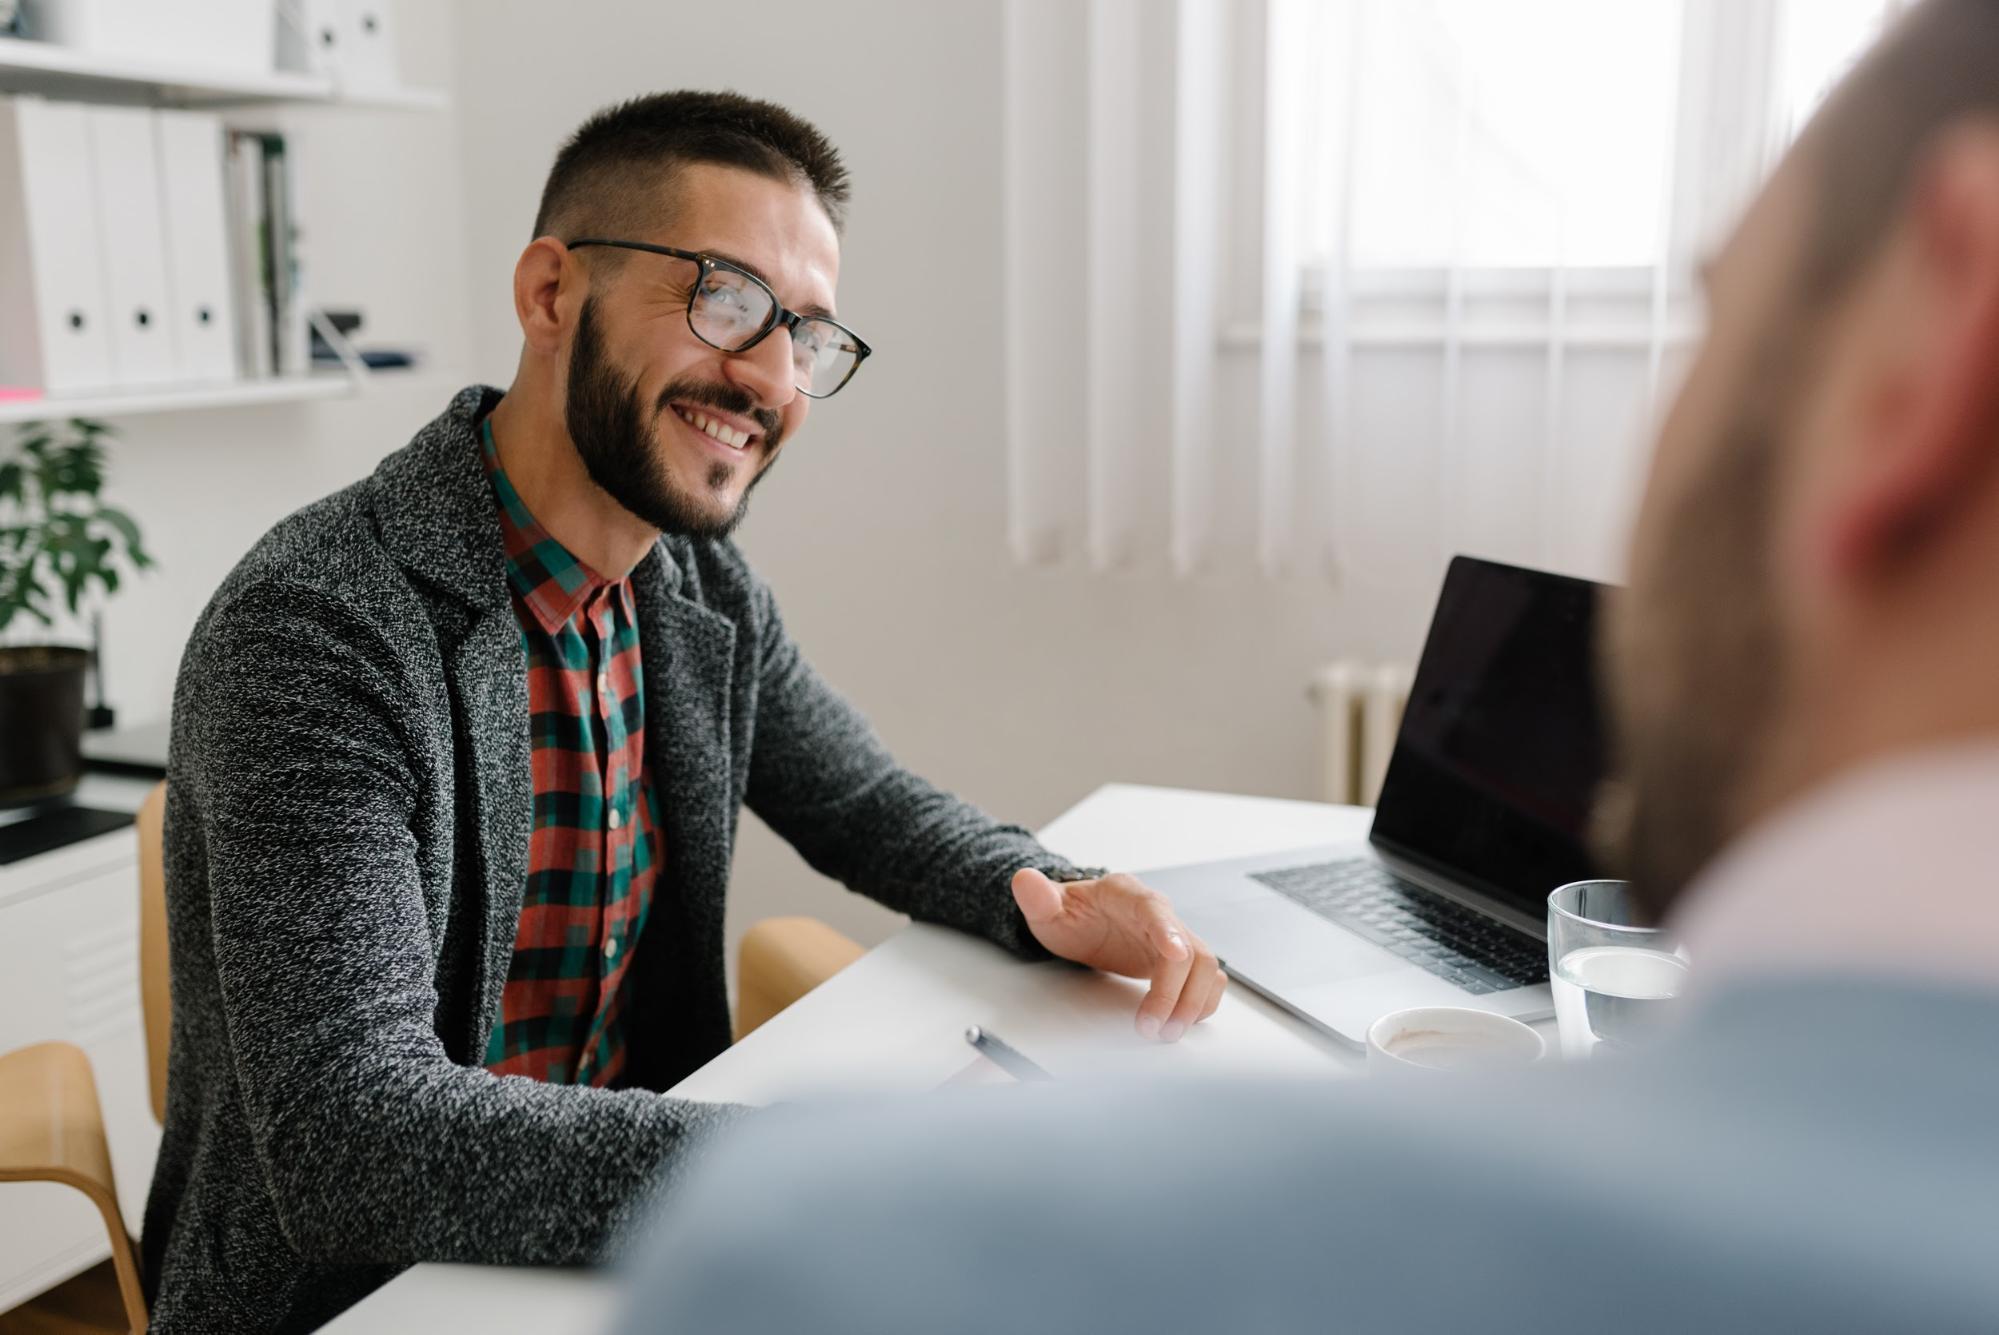 Human resource internships: Man talking to applicant